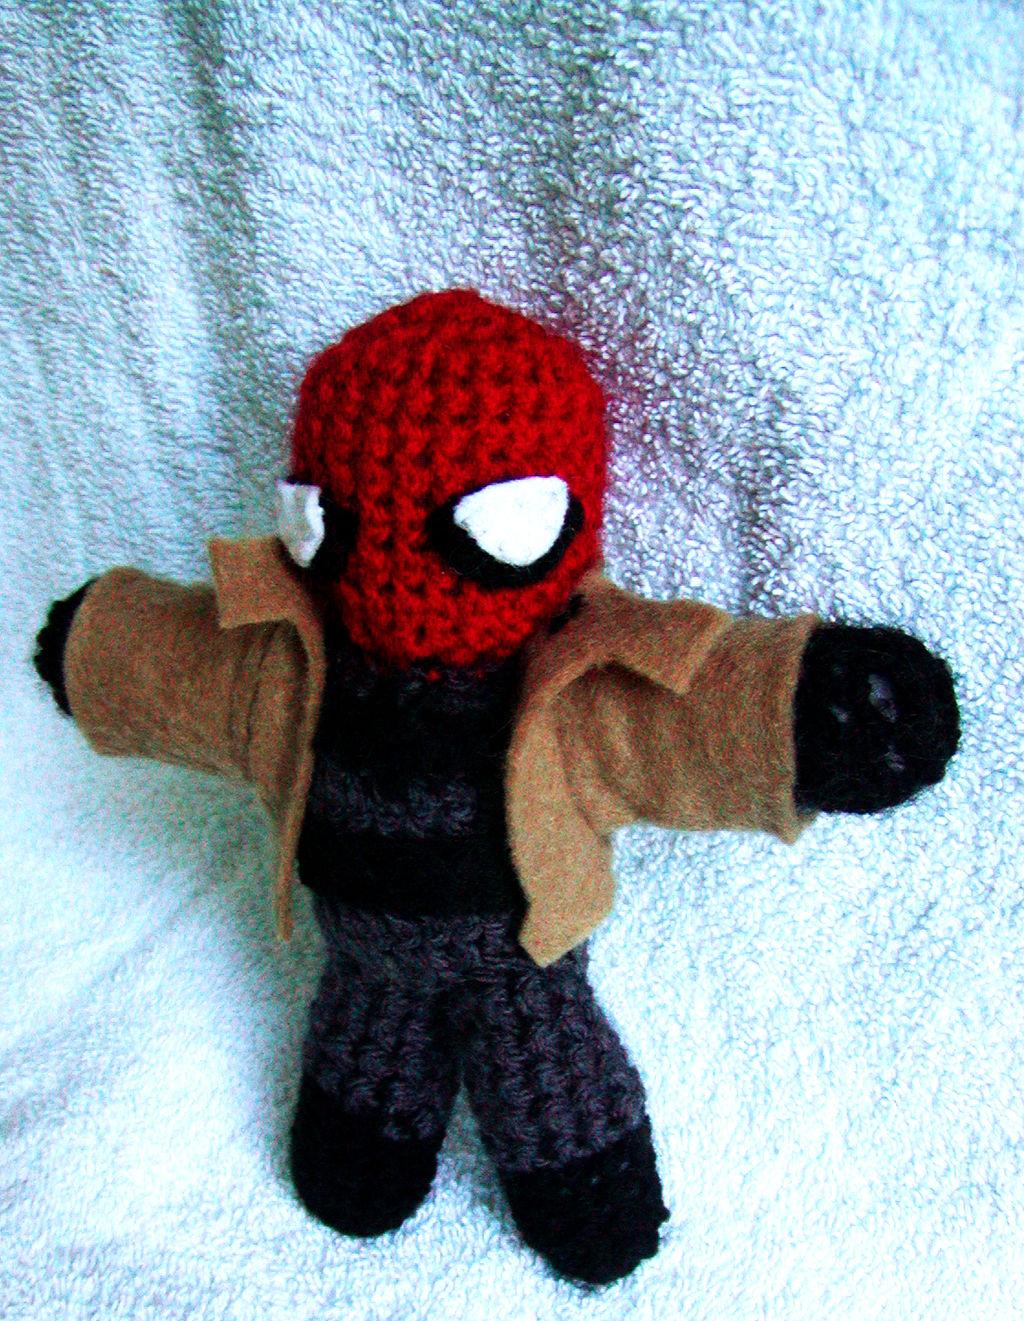 Batman Croche Amigurumi Boneco Pelucia Brinquedo Criança Toy - R ... | 1321x1024